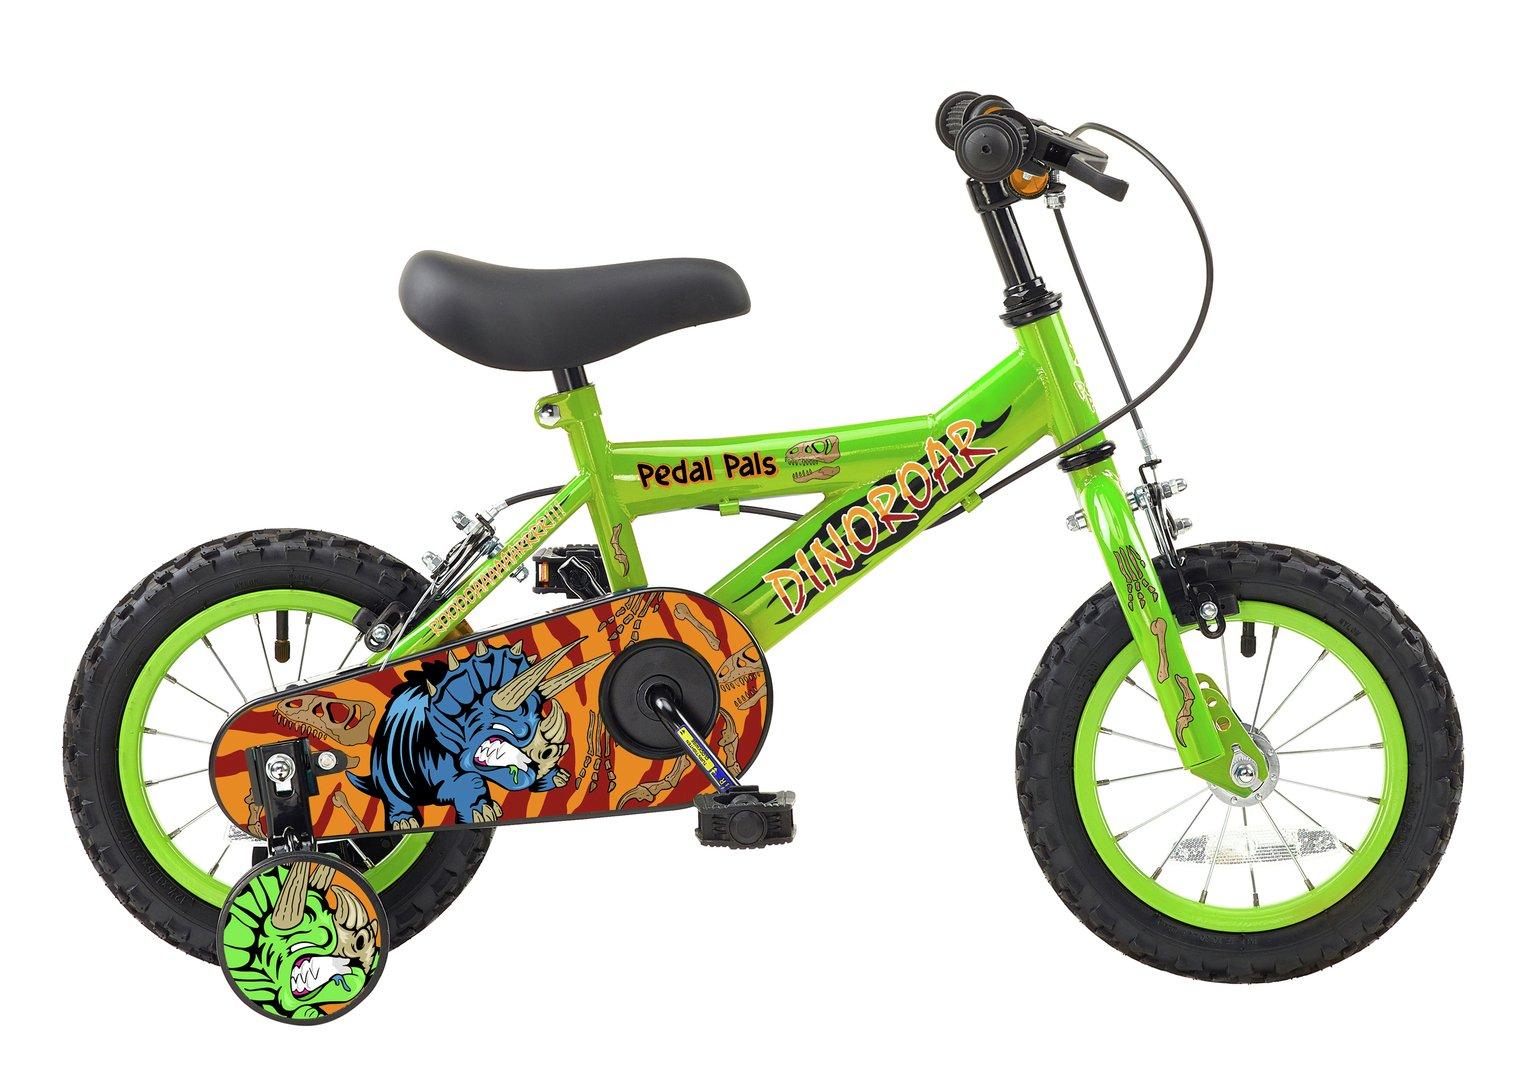 Pedal Pals 12 Inch Wheel Size Dinoroar Kids Bike